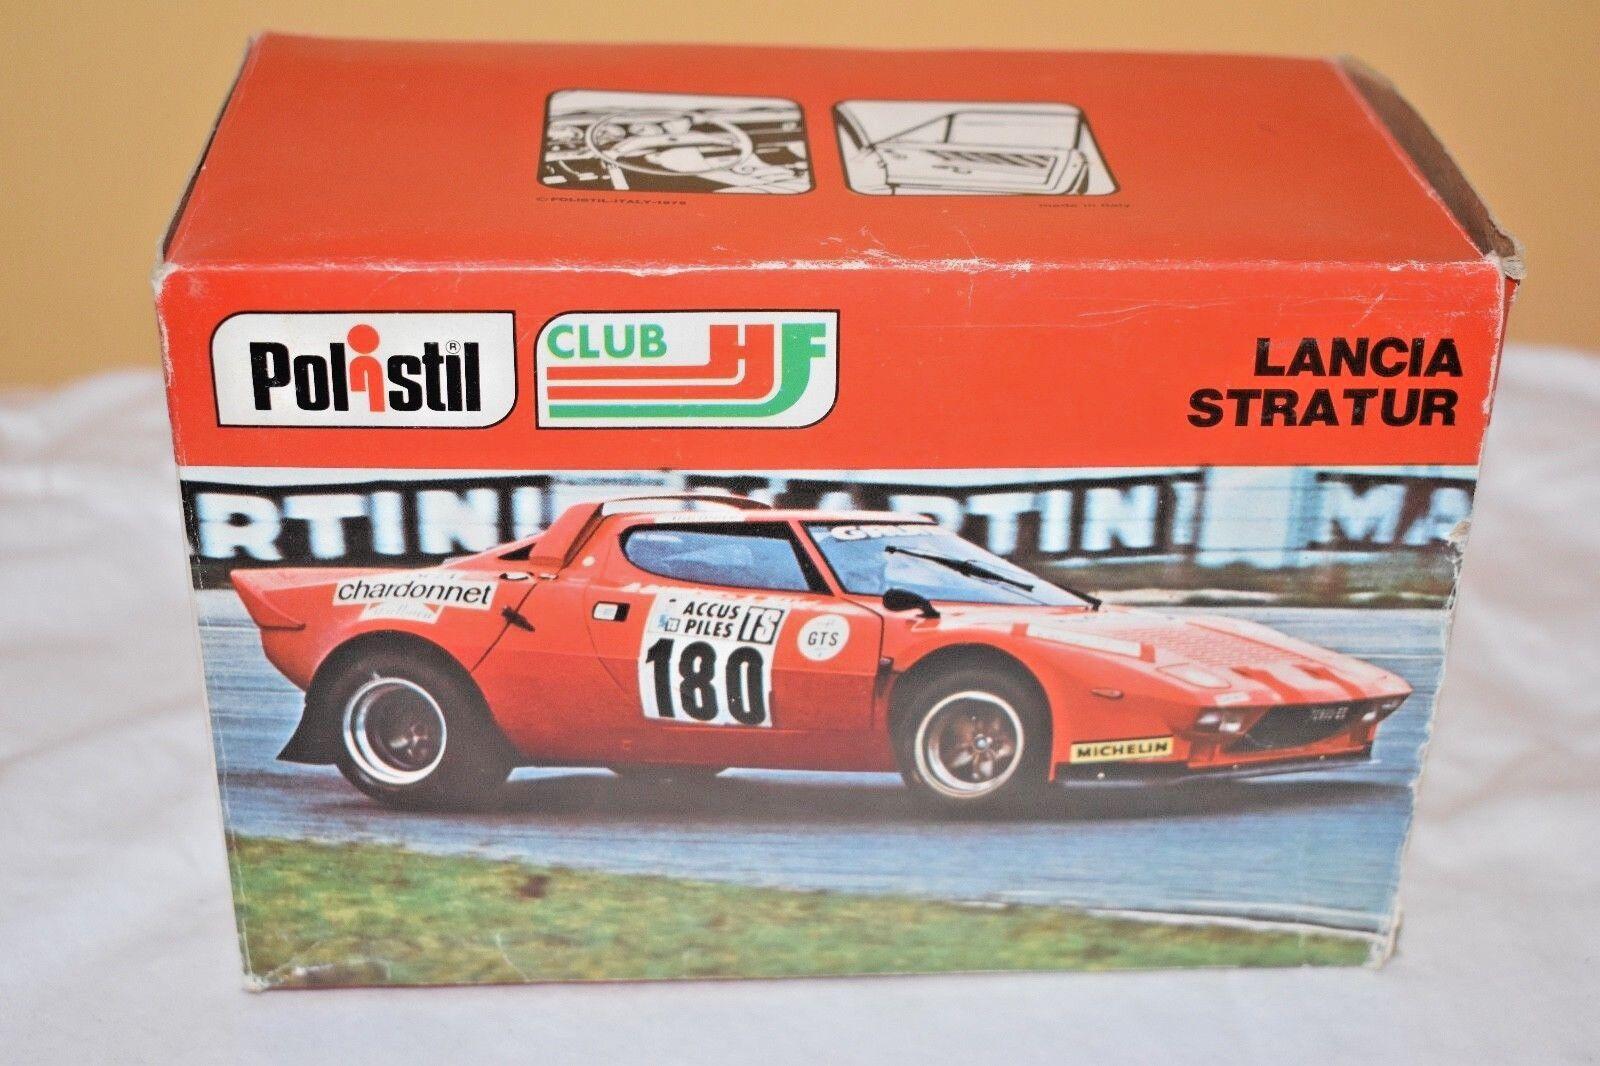 Stratur Die S32; Modello Polisti Cast; Lancia nOk80wP